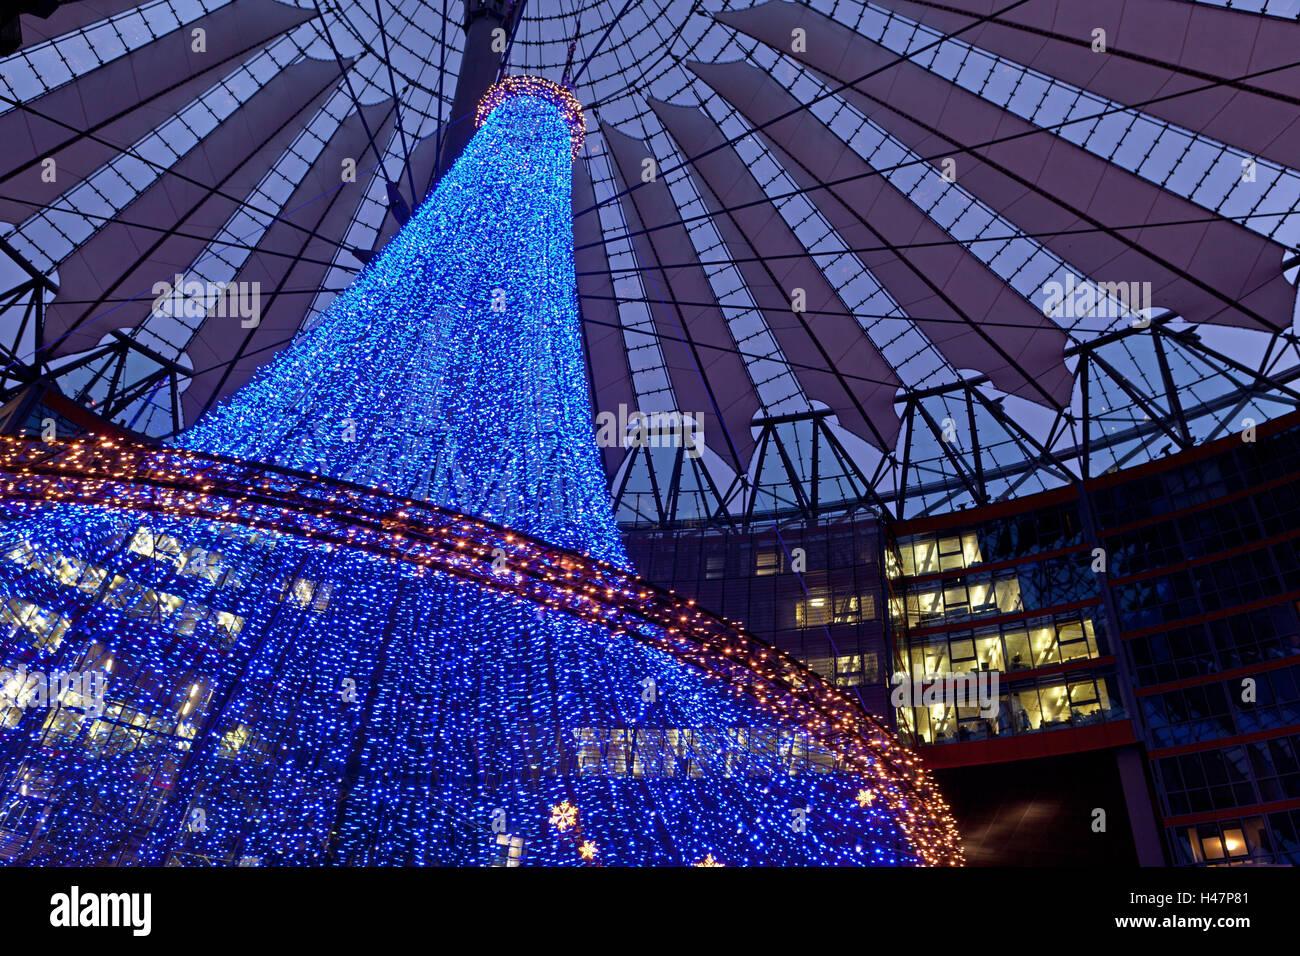 Moderne Weihnachtsbeleuchtung.Deutschland Berlin Potsdamer Platz Sony Center Modernen